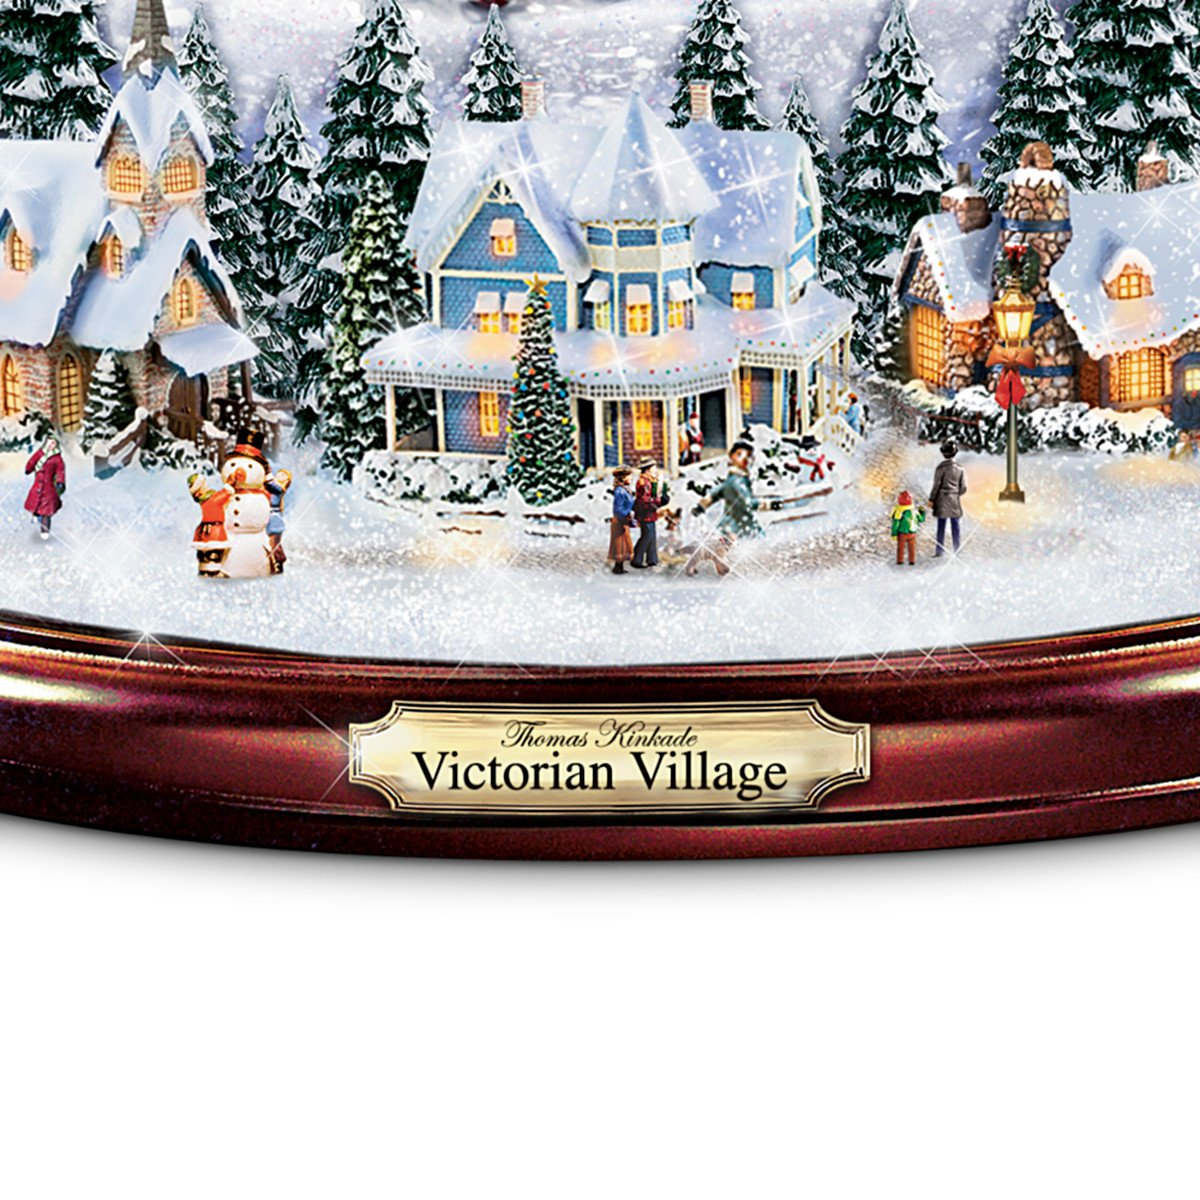 Amazon.com: Thomas Kinkade Victorian Village Illuminated Musical ...